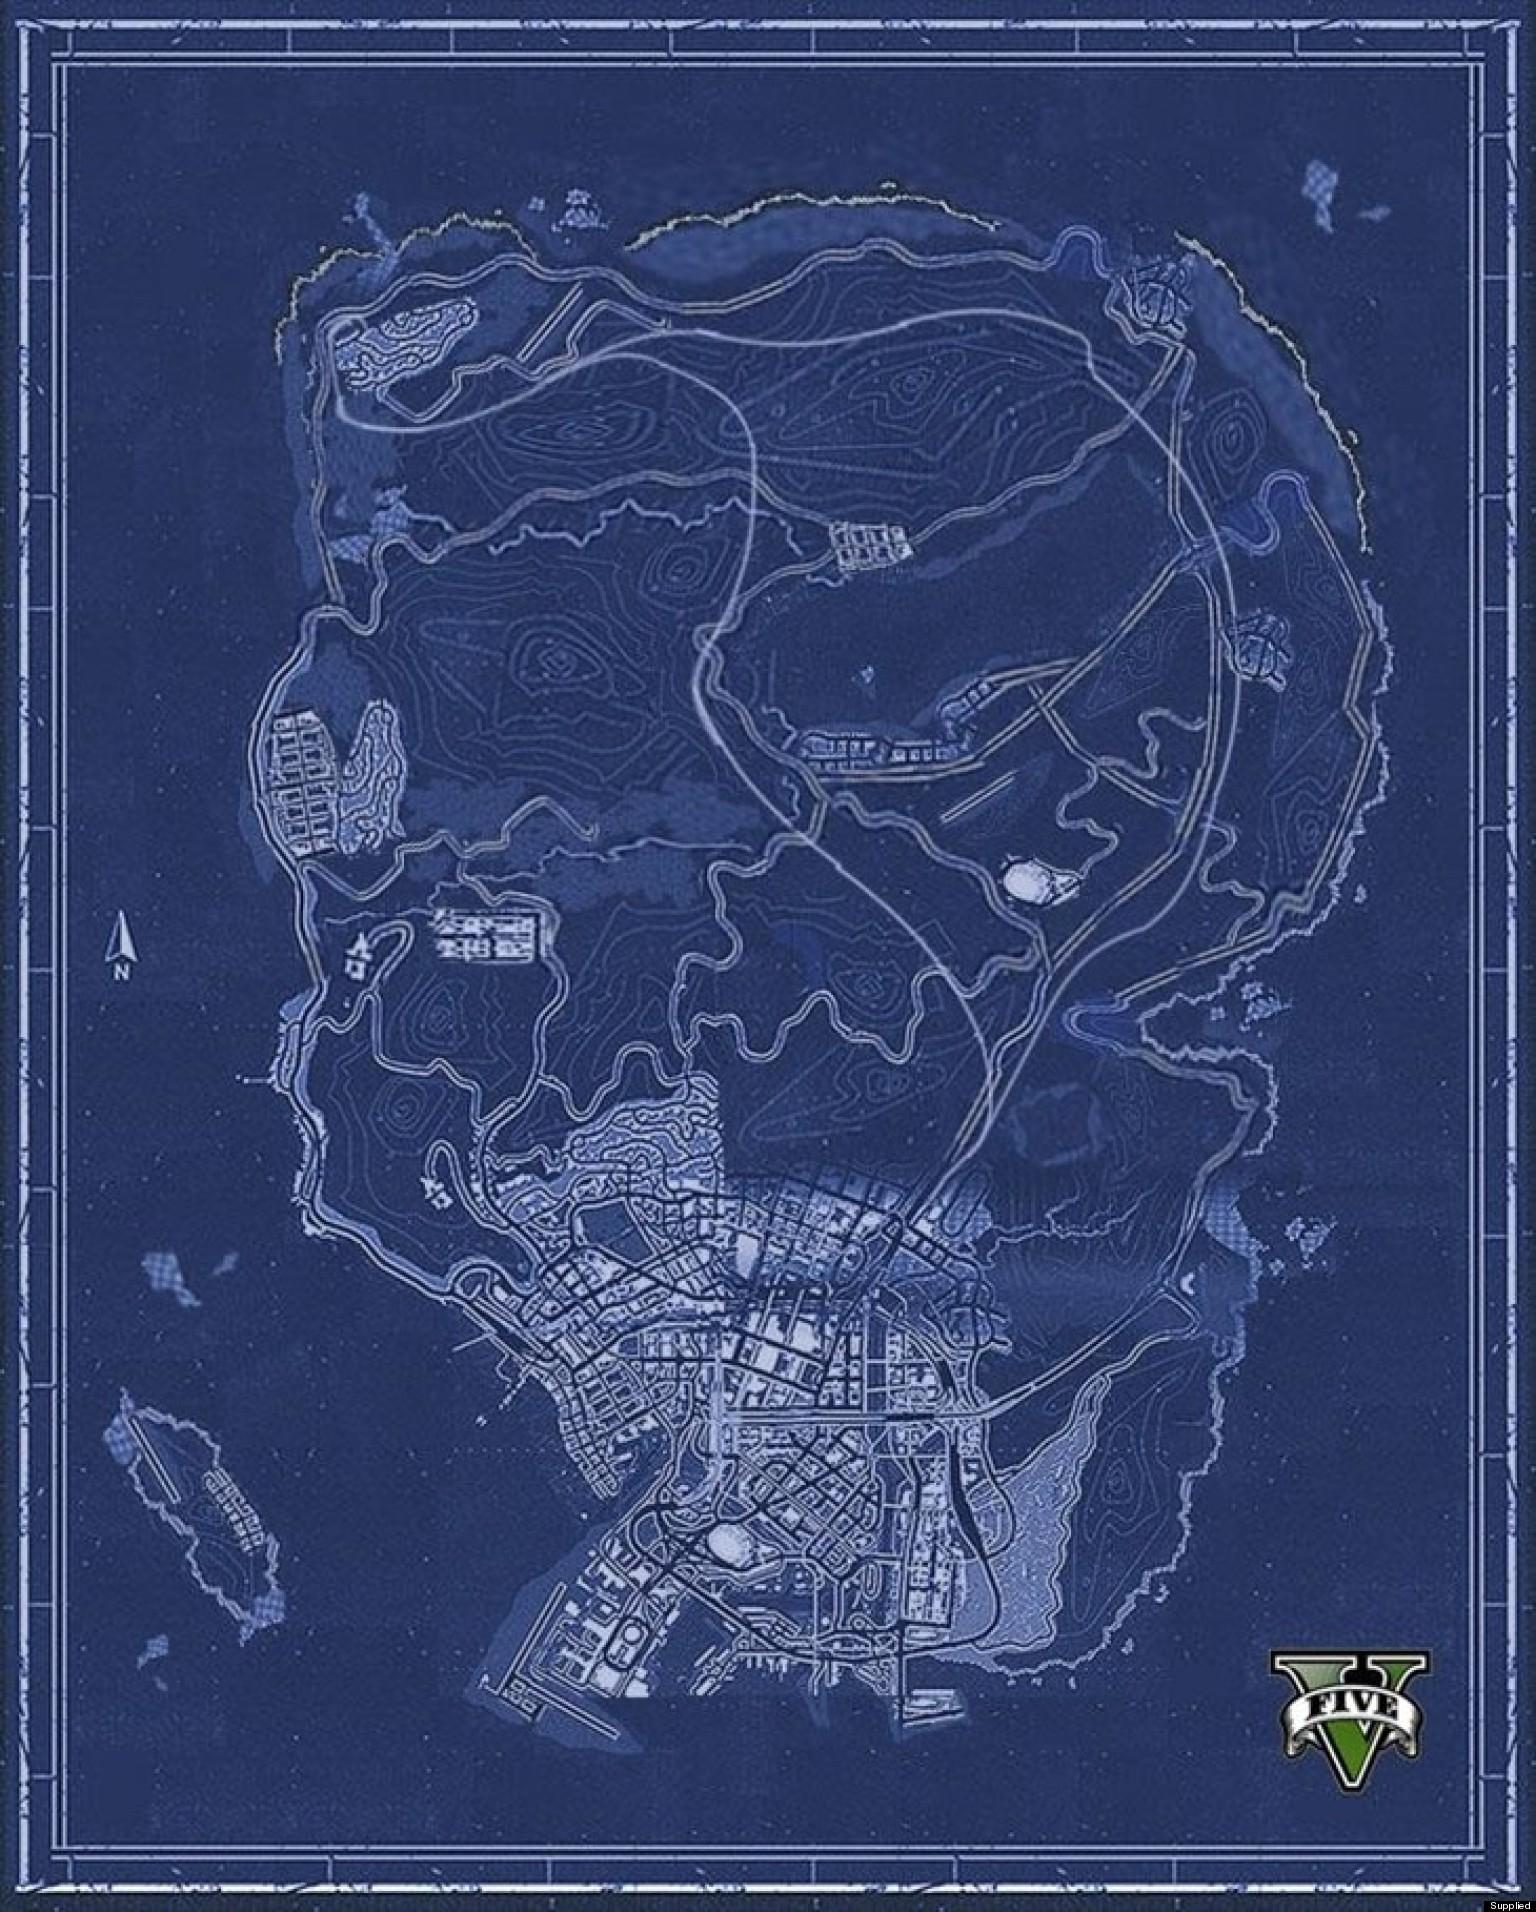 Secret Places Gta 5 Ps4: GTA 5 Fan's Project Reveals Full Los Santos Map